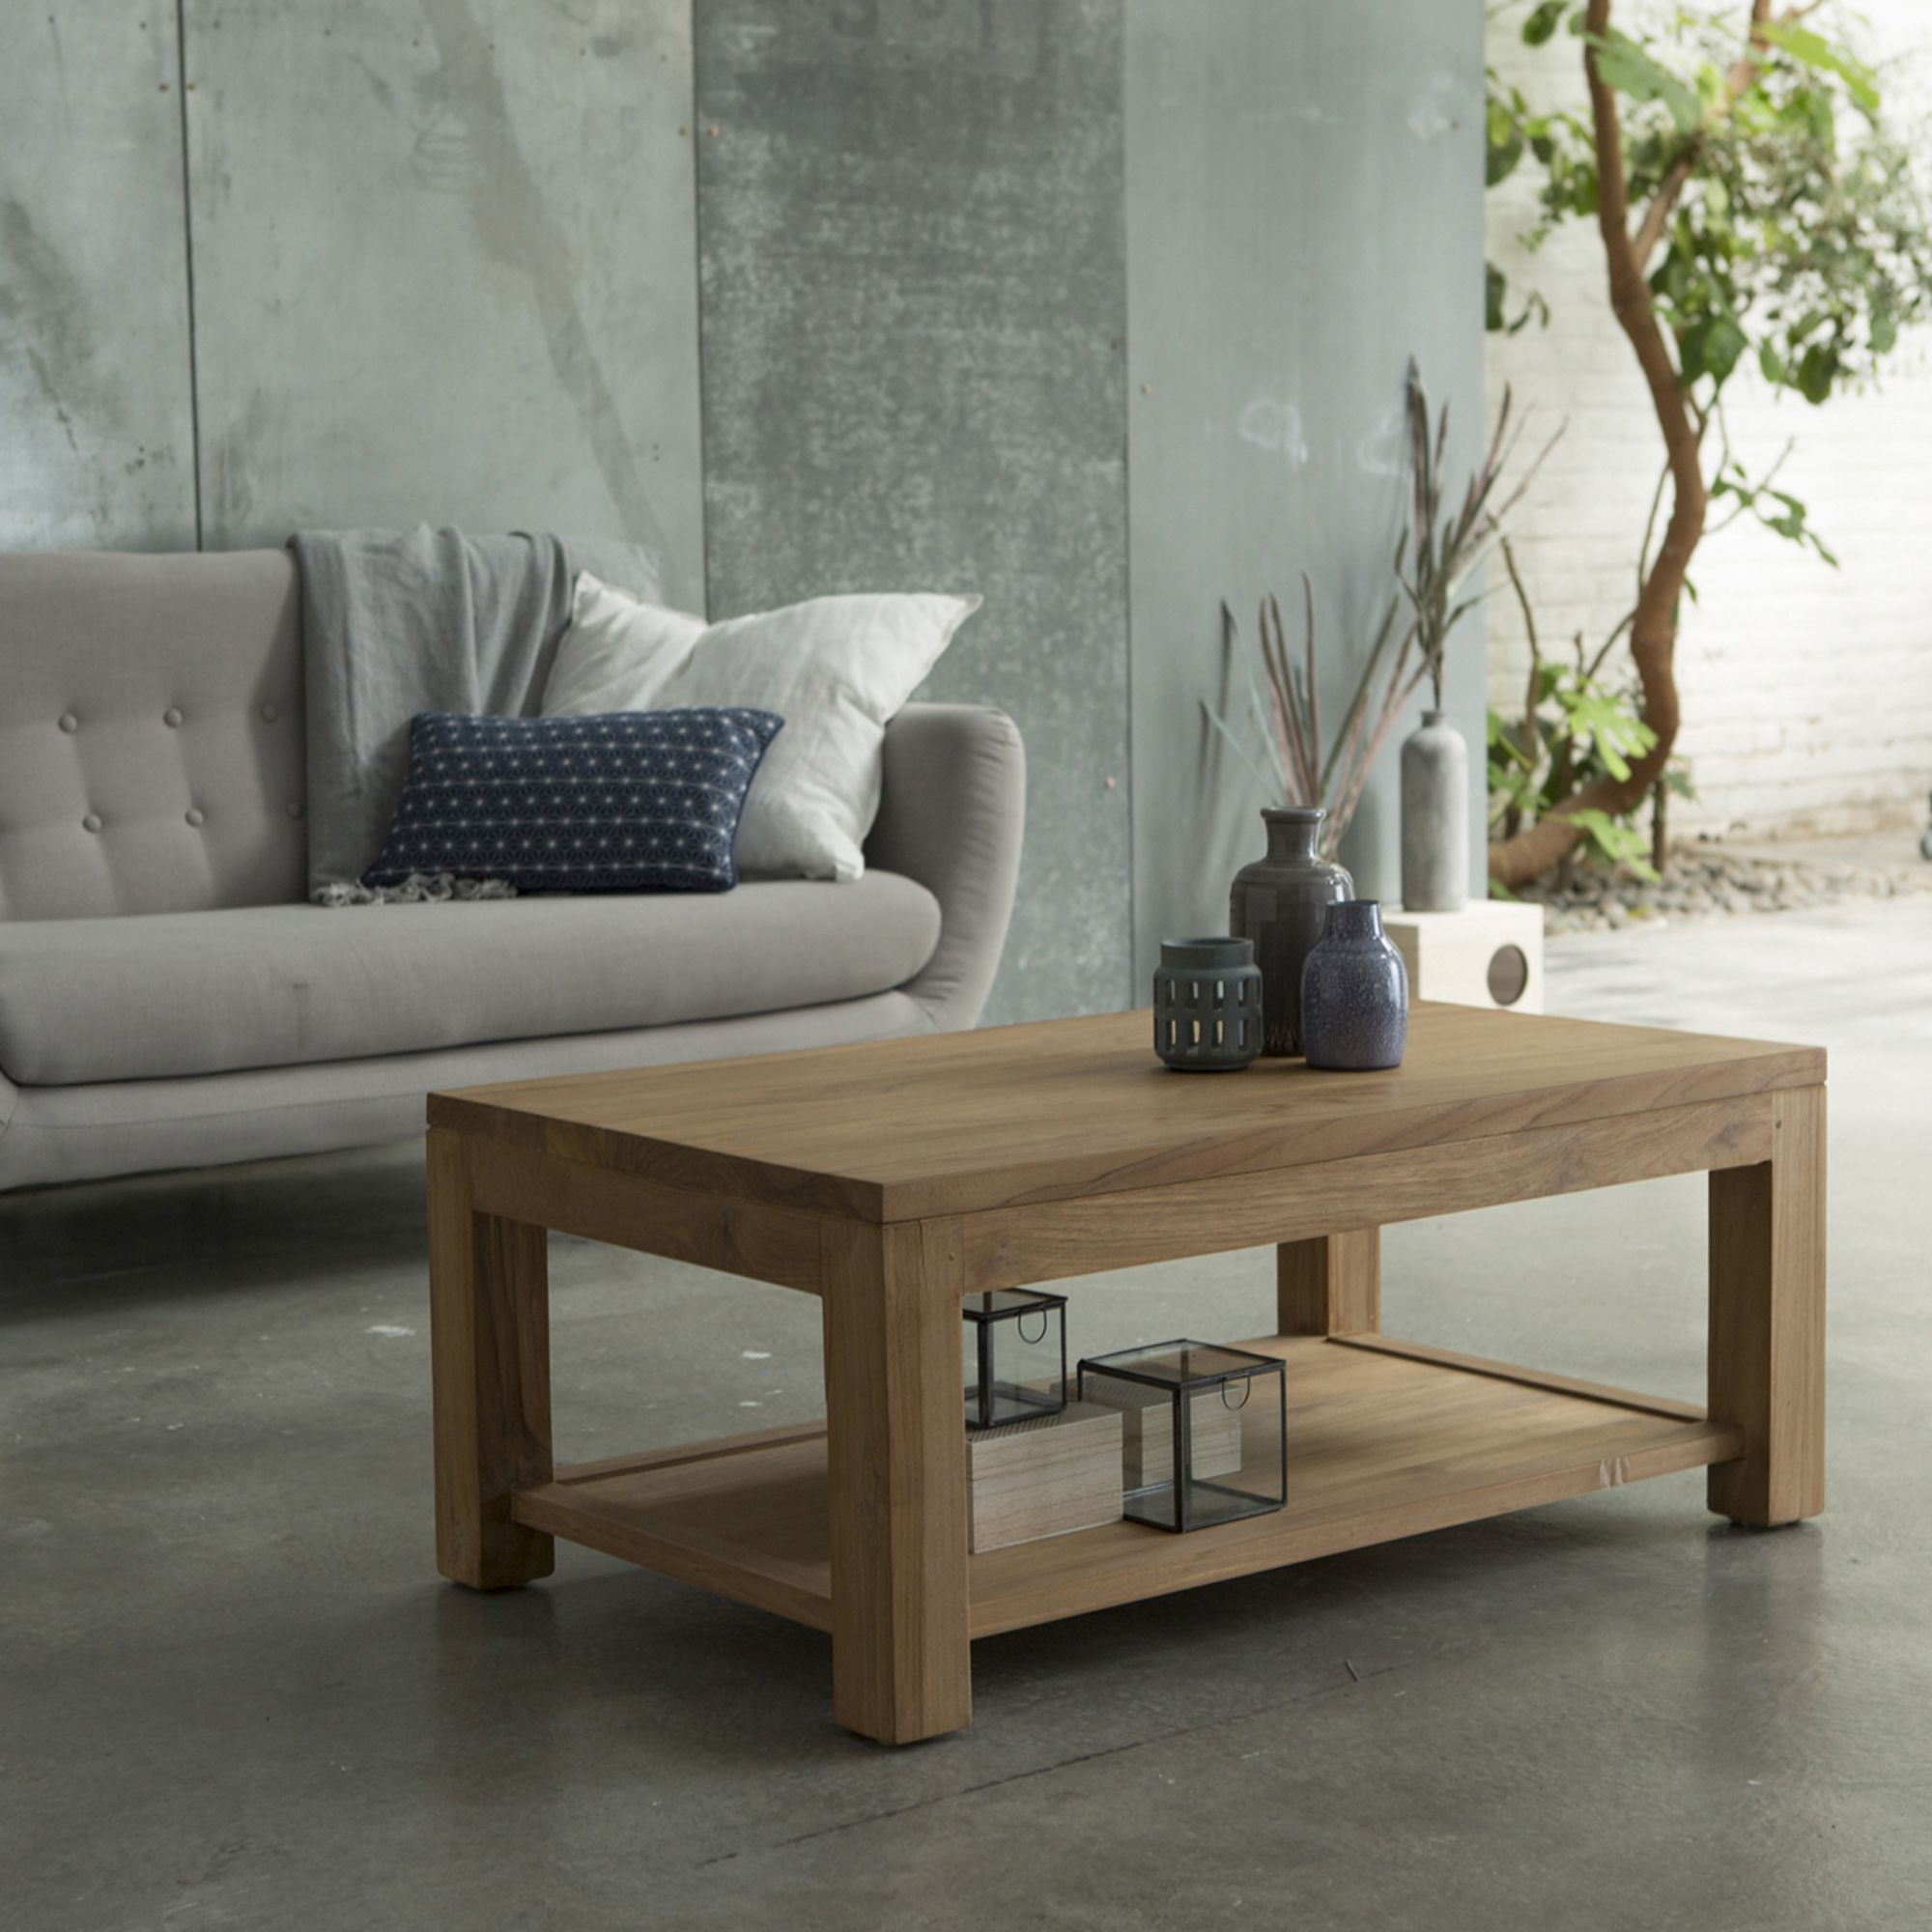 Eve Teak Coffee Table 100x60 In 2020 Teak Coffee Table Table